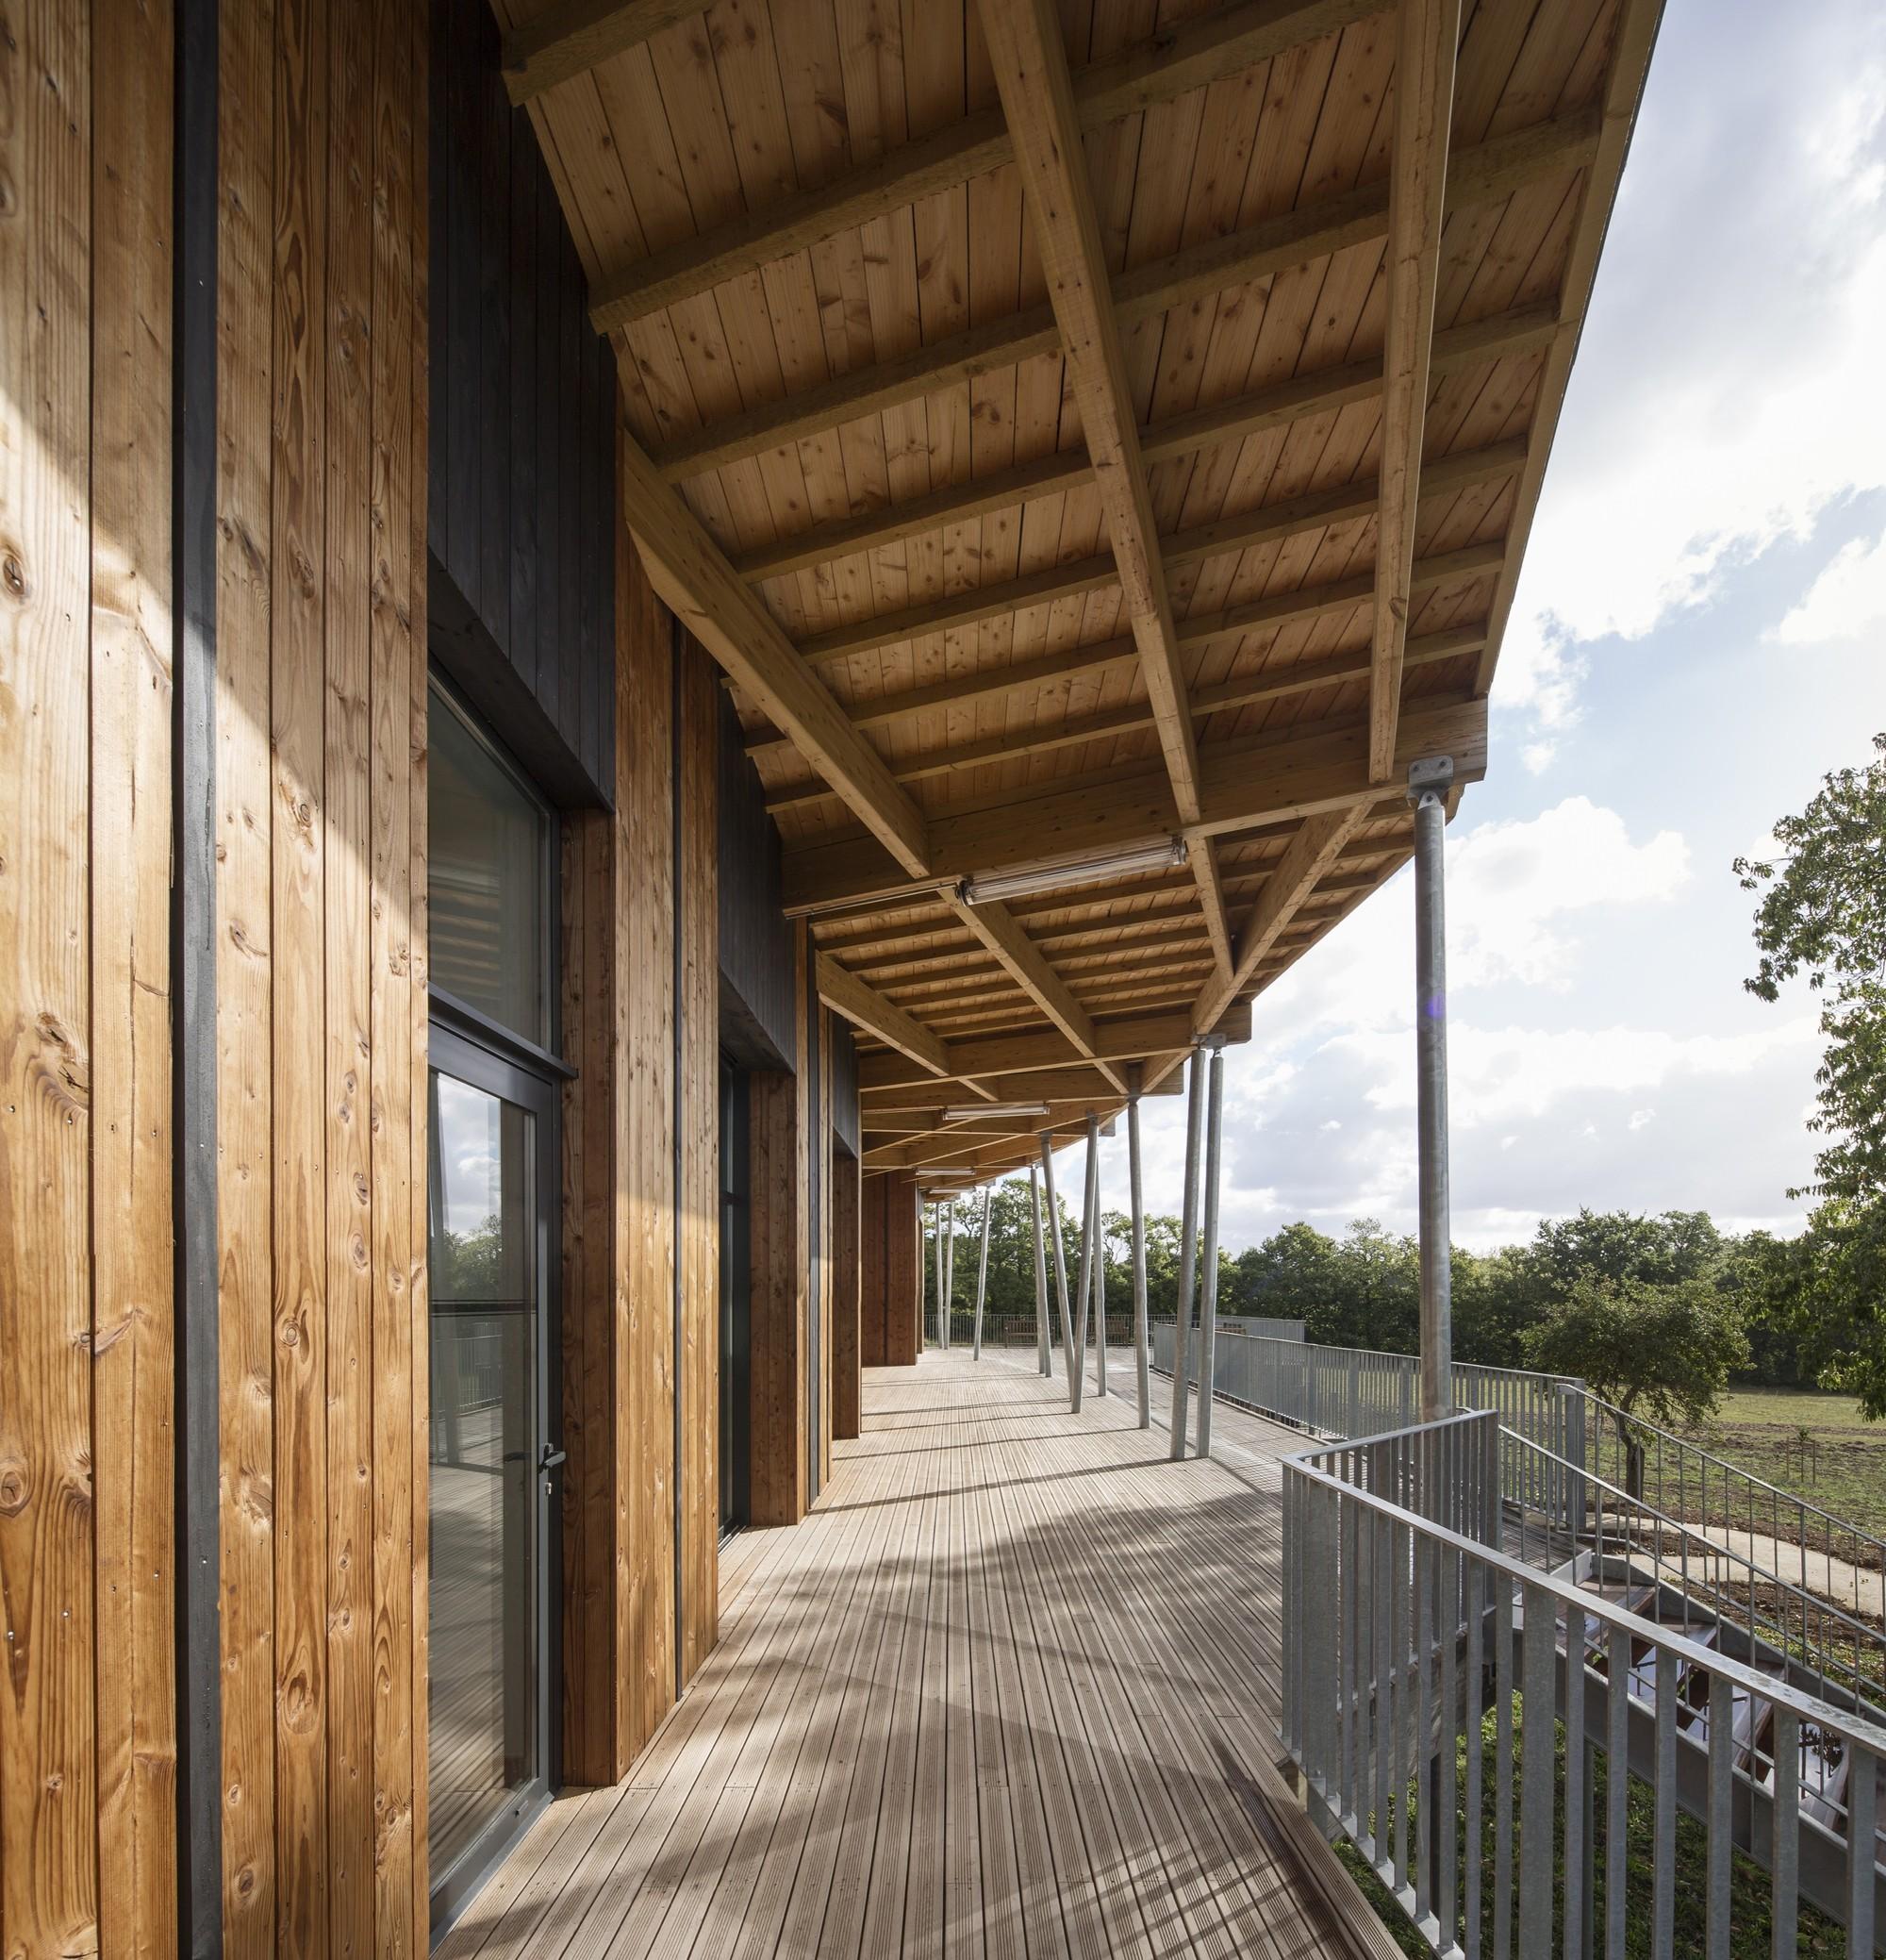 Galer a de vivienda para mayores concoret nomade for Architecture nomade